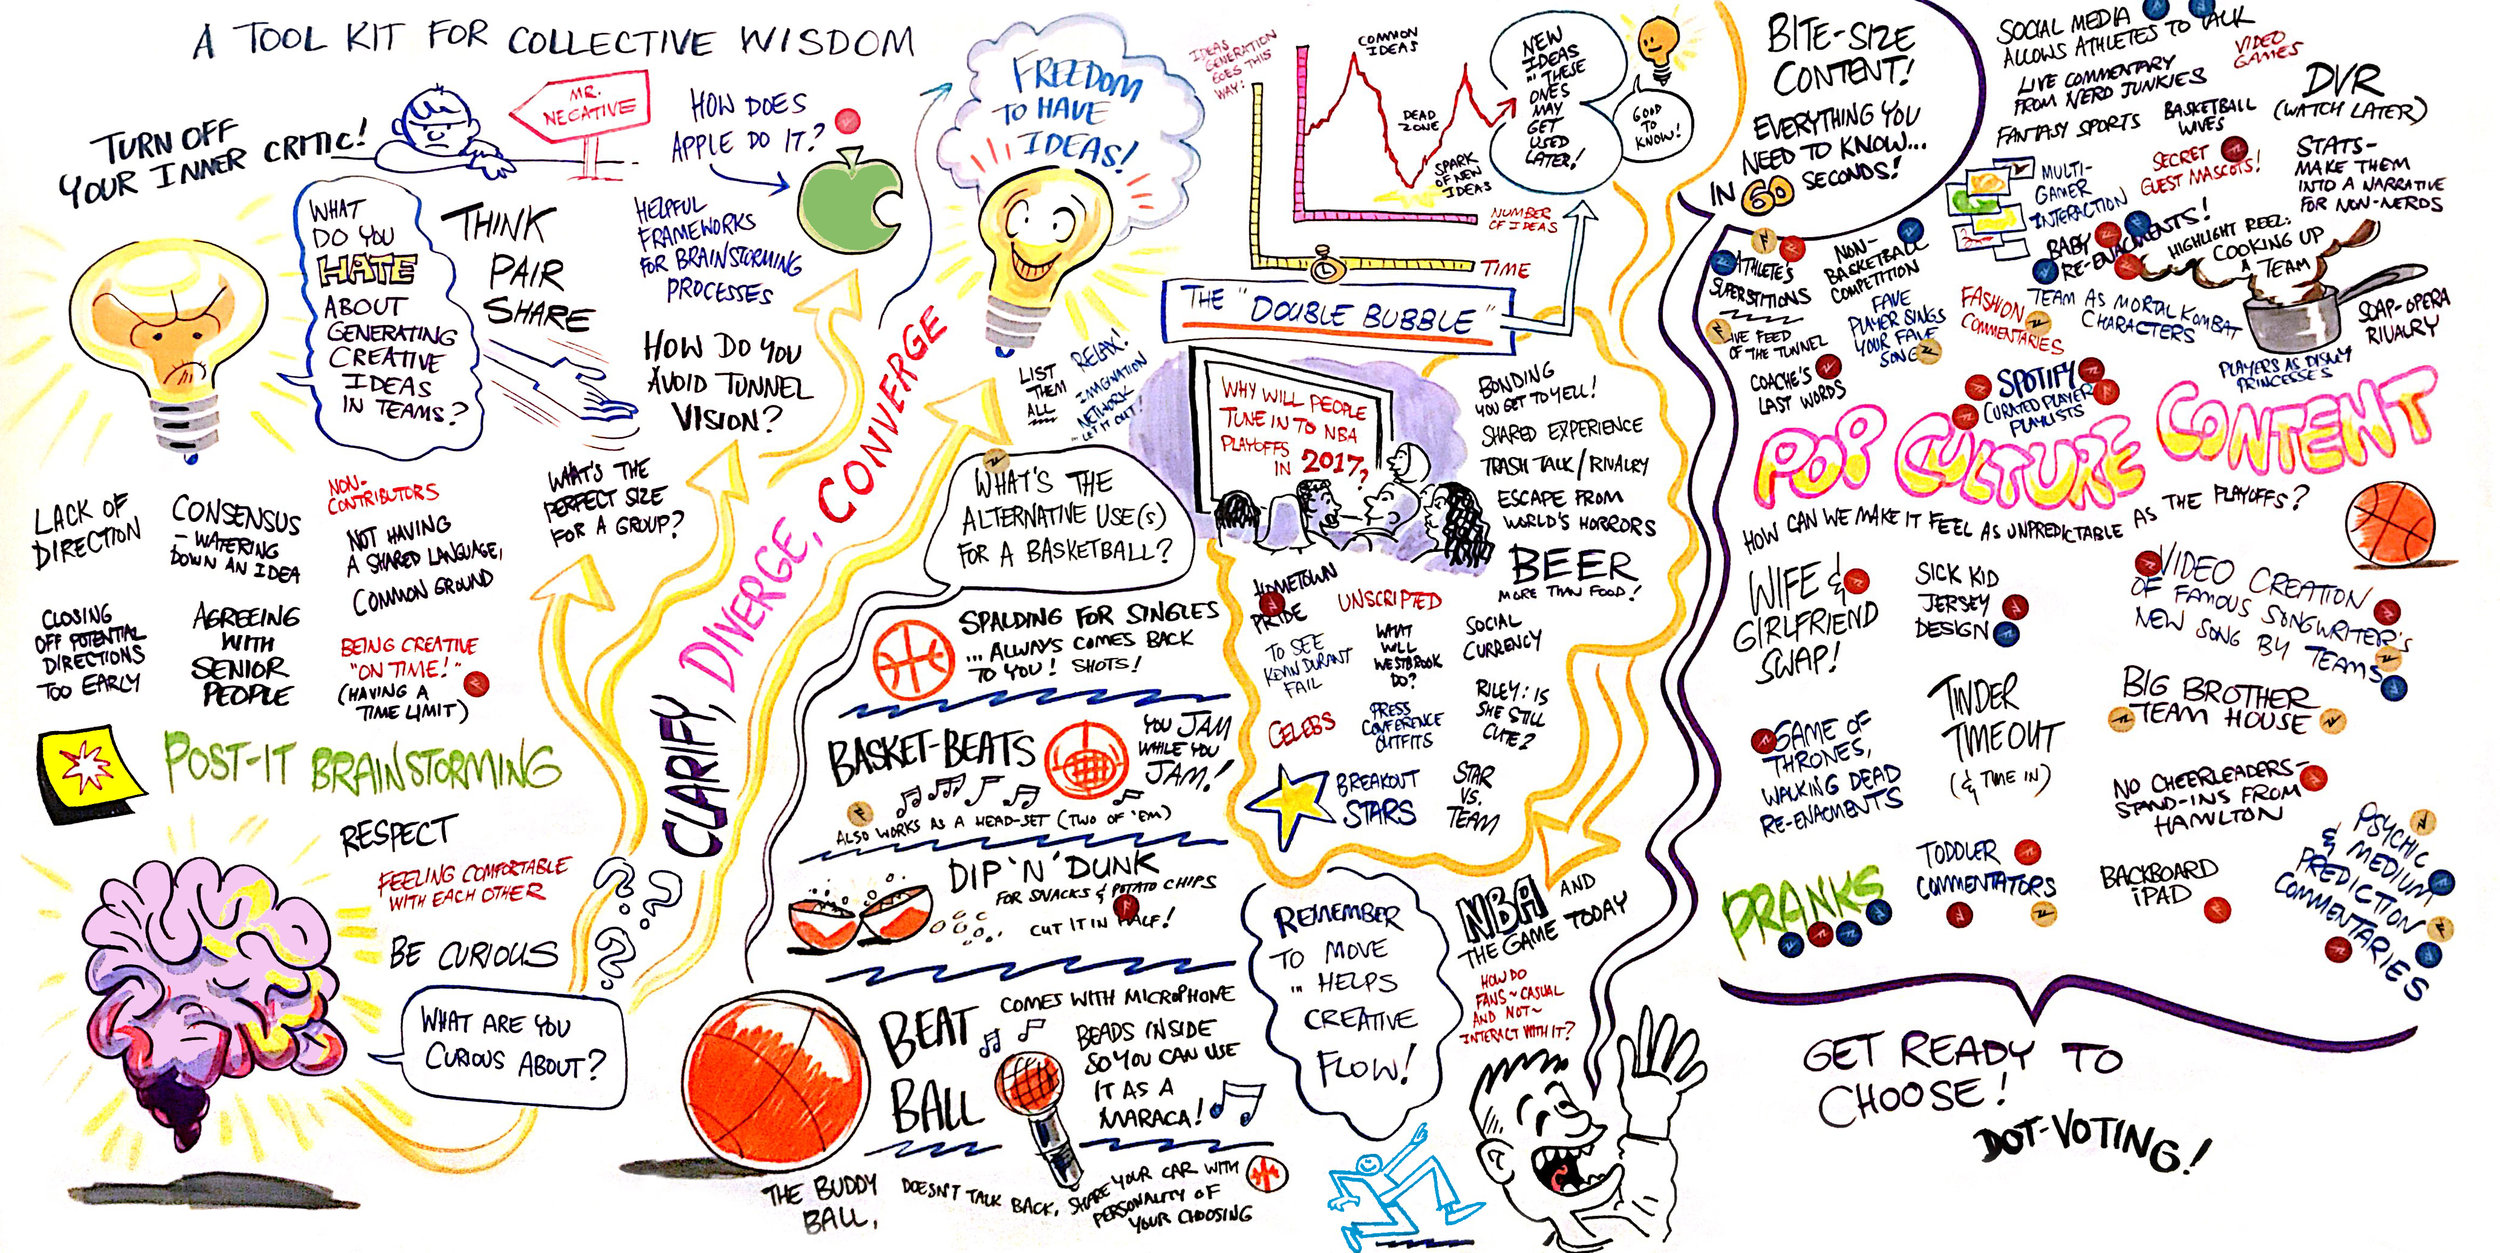 05-creativity-workshops.jpg